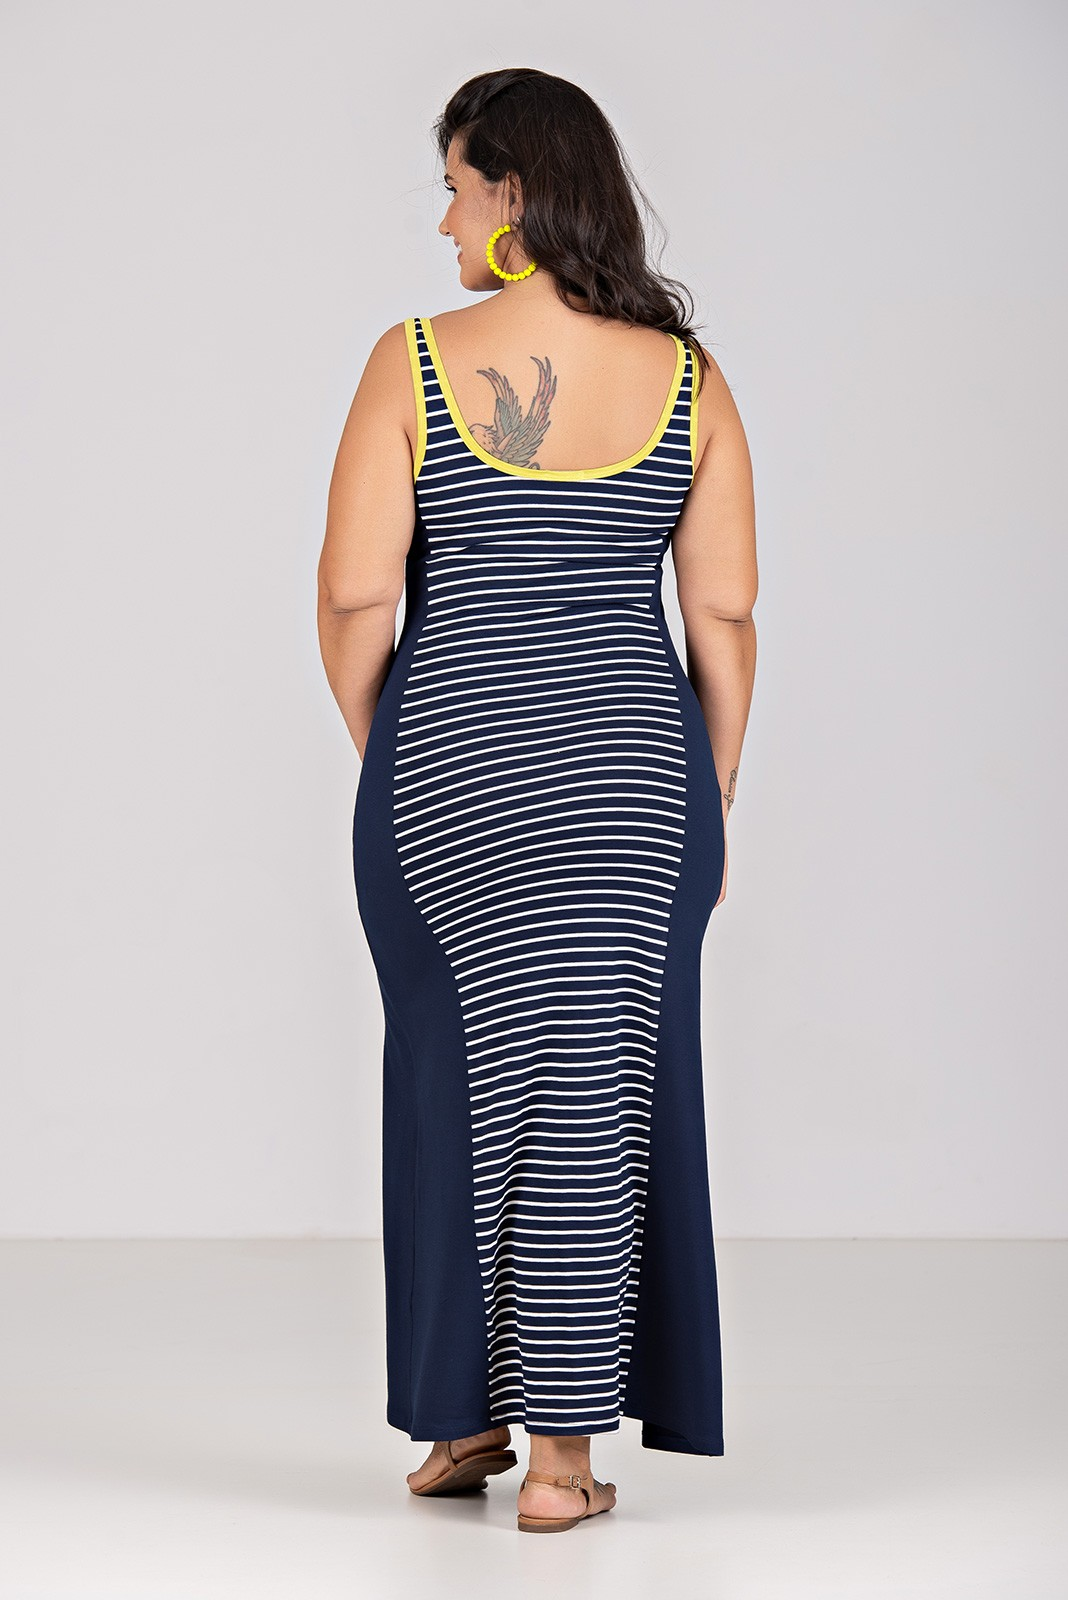 Vestido Longo de Malha Listrada com recorte - Plus Size